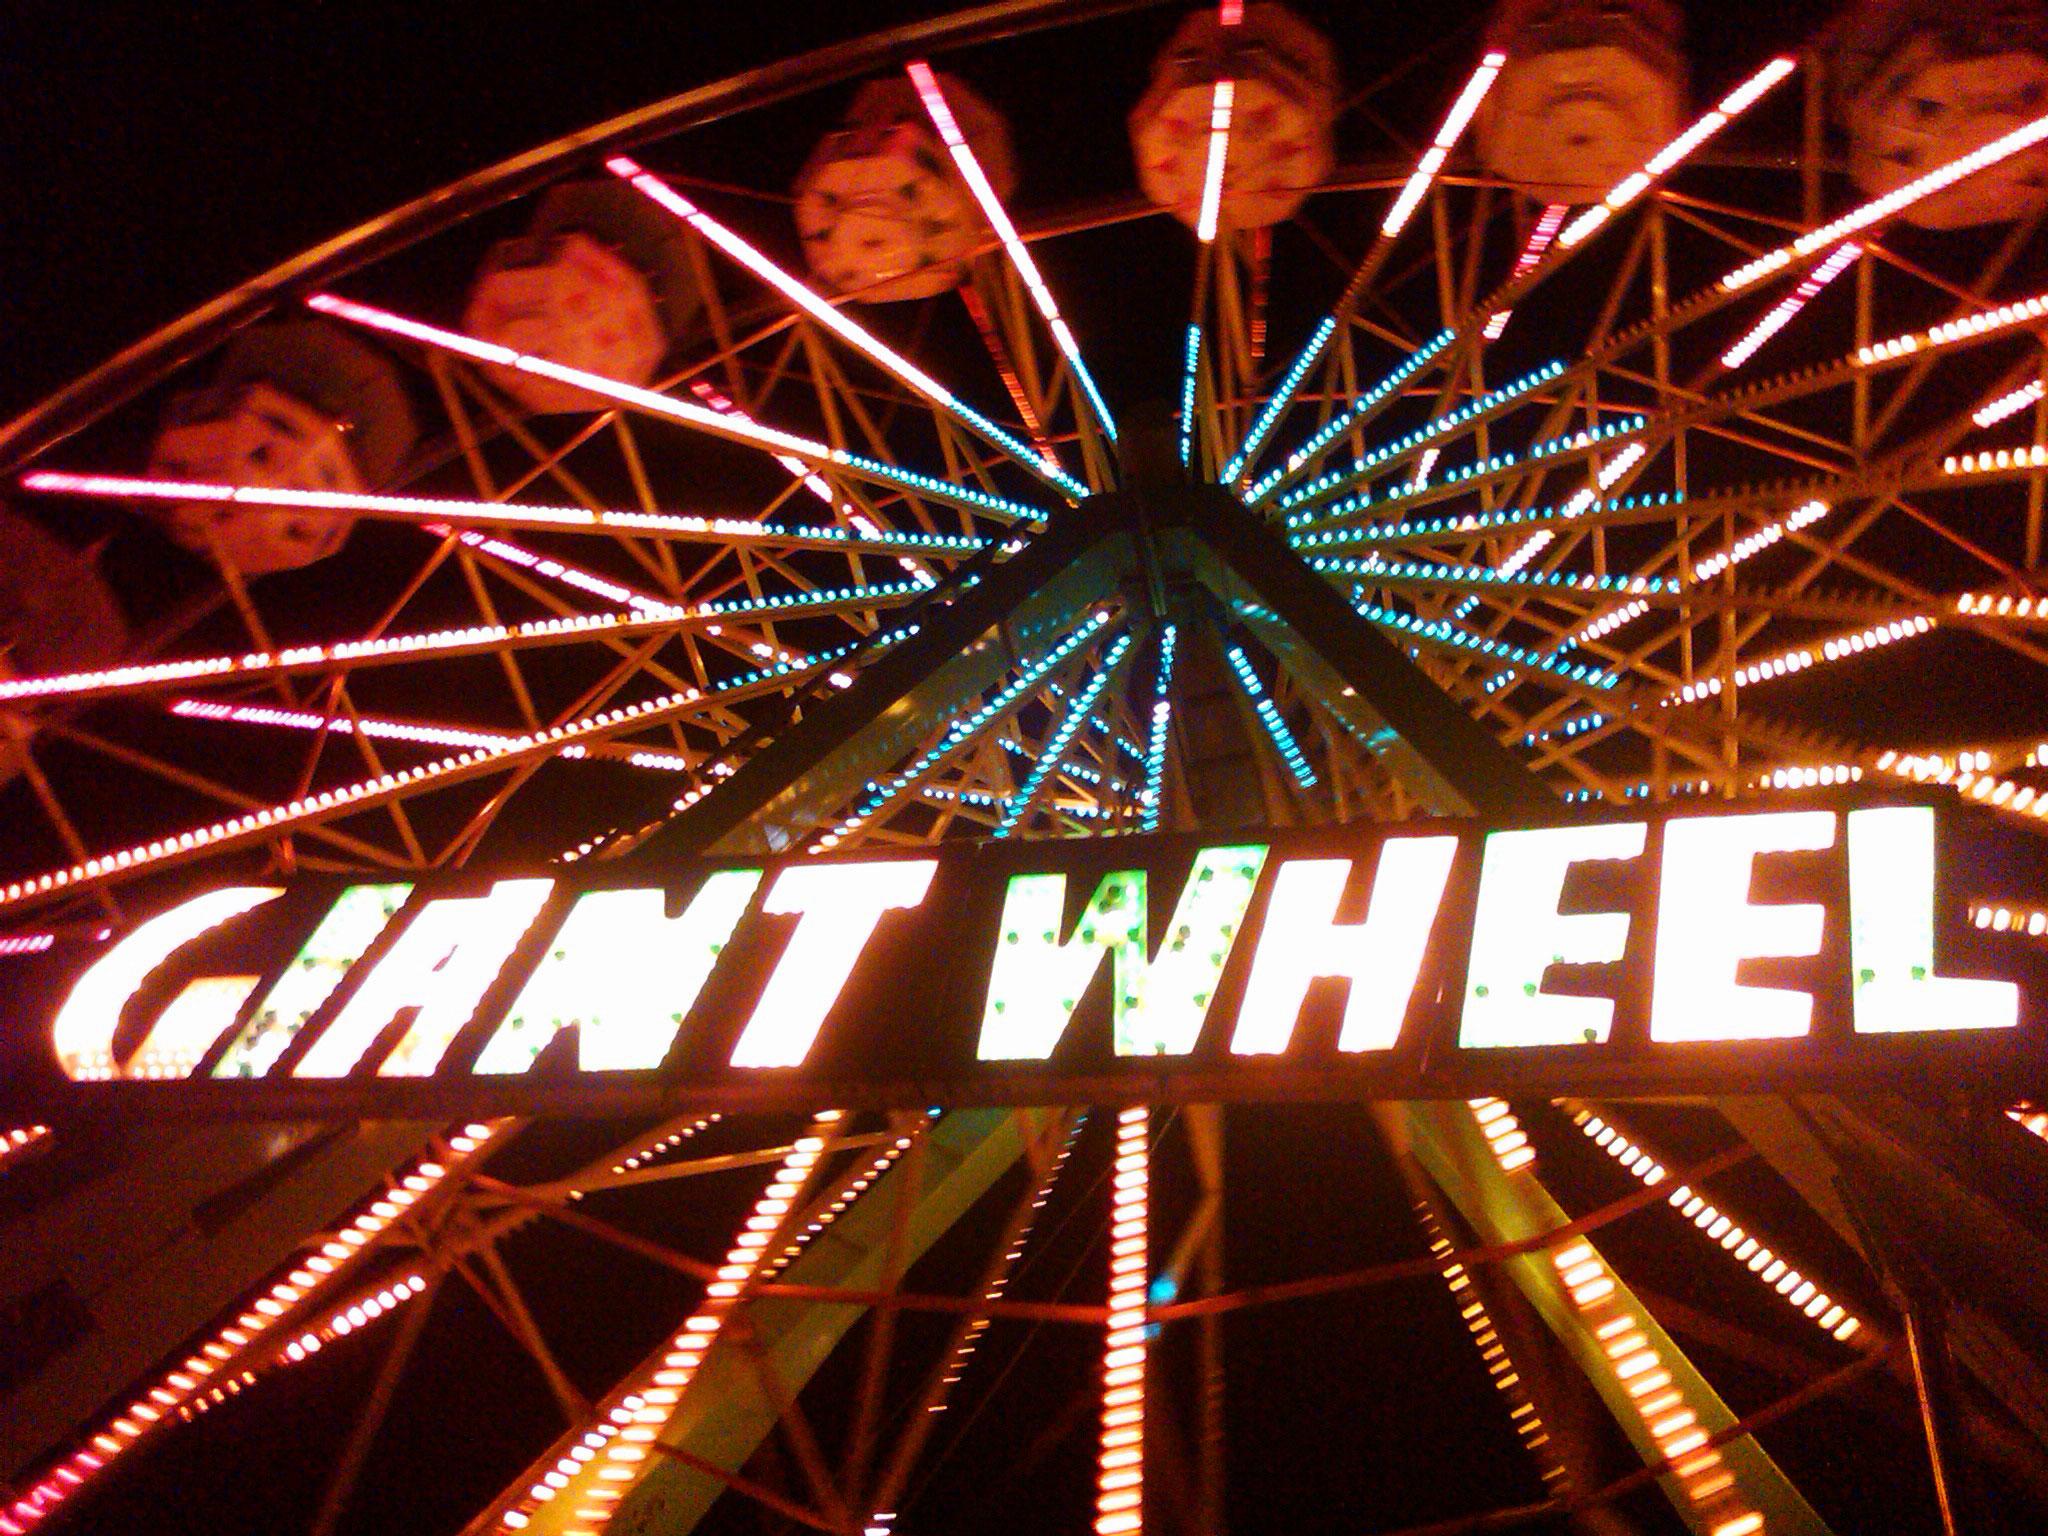 Giant-Wheel